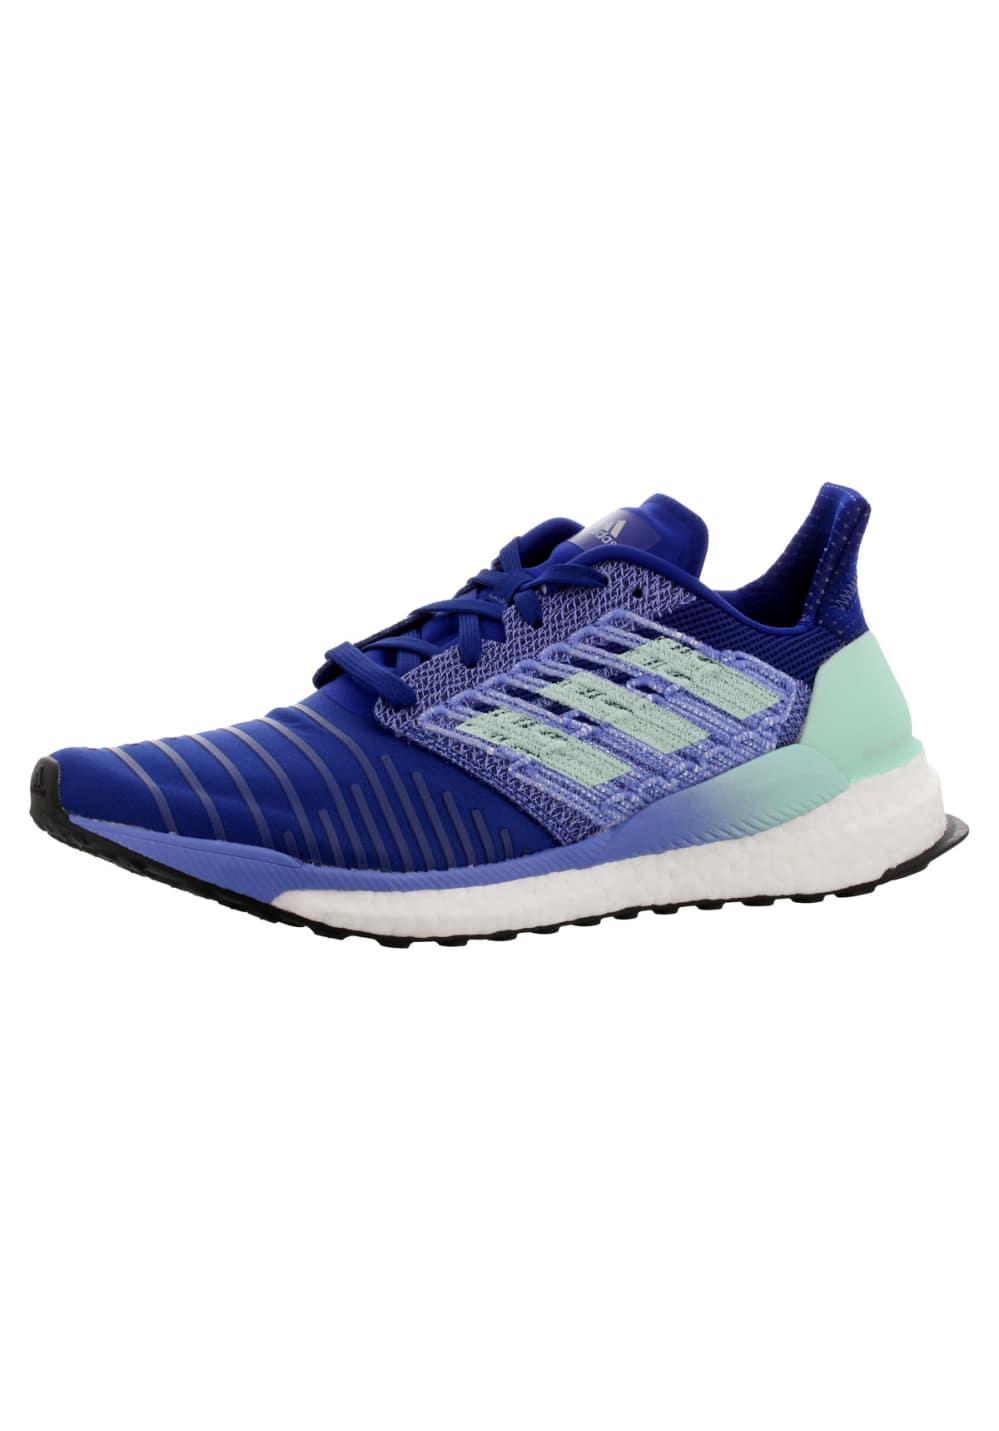 adidas Solar Boost - Laufschuhe für Damen - Blau, Gr. 39 1/3